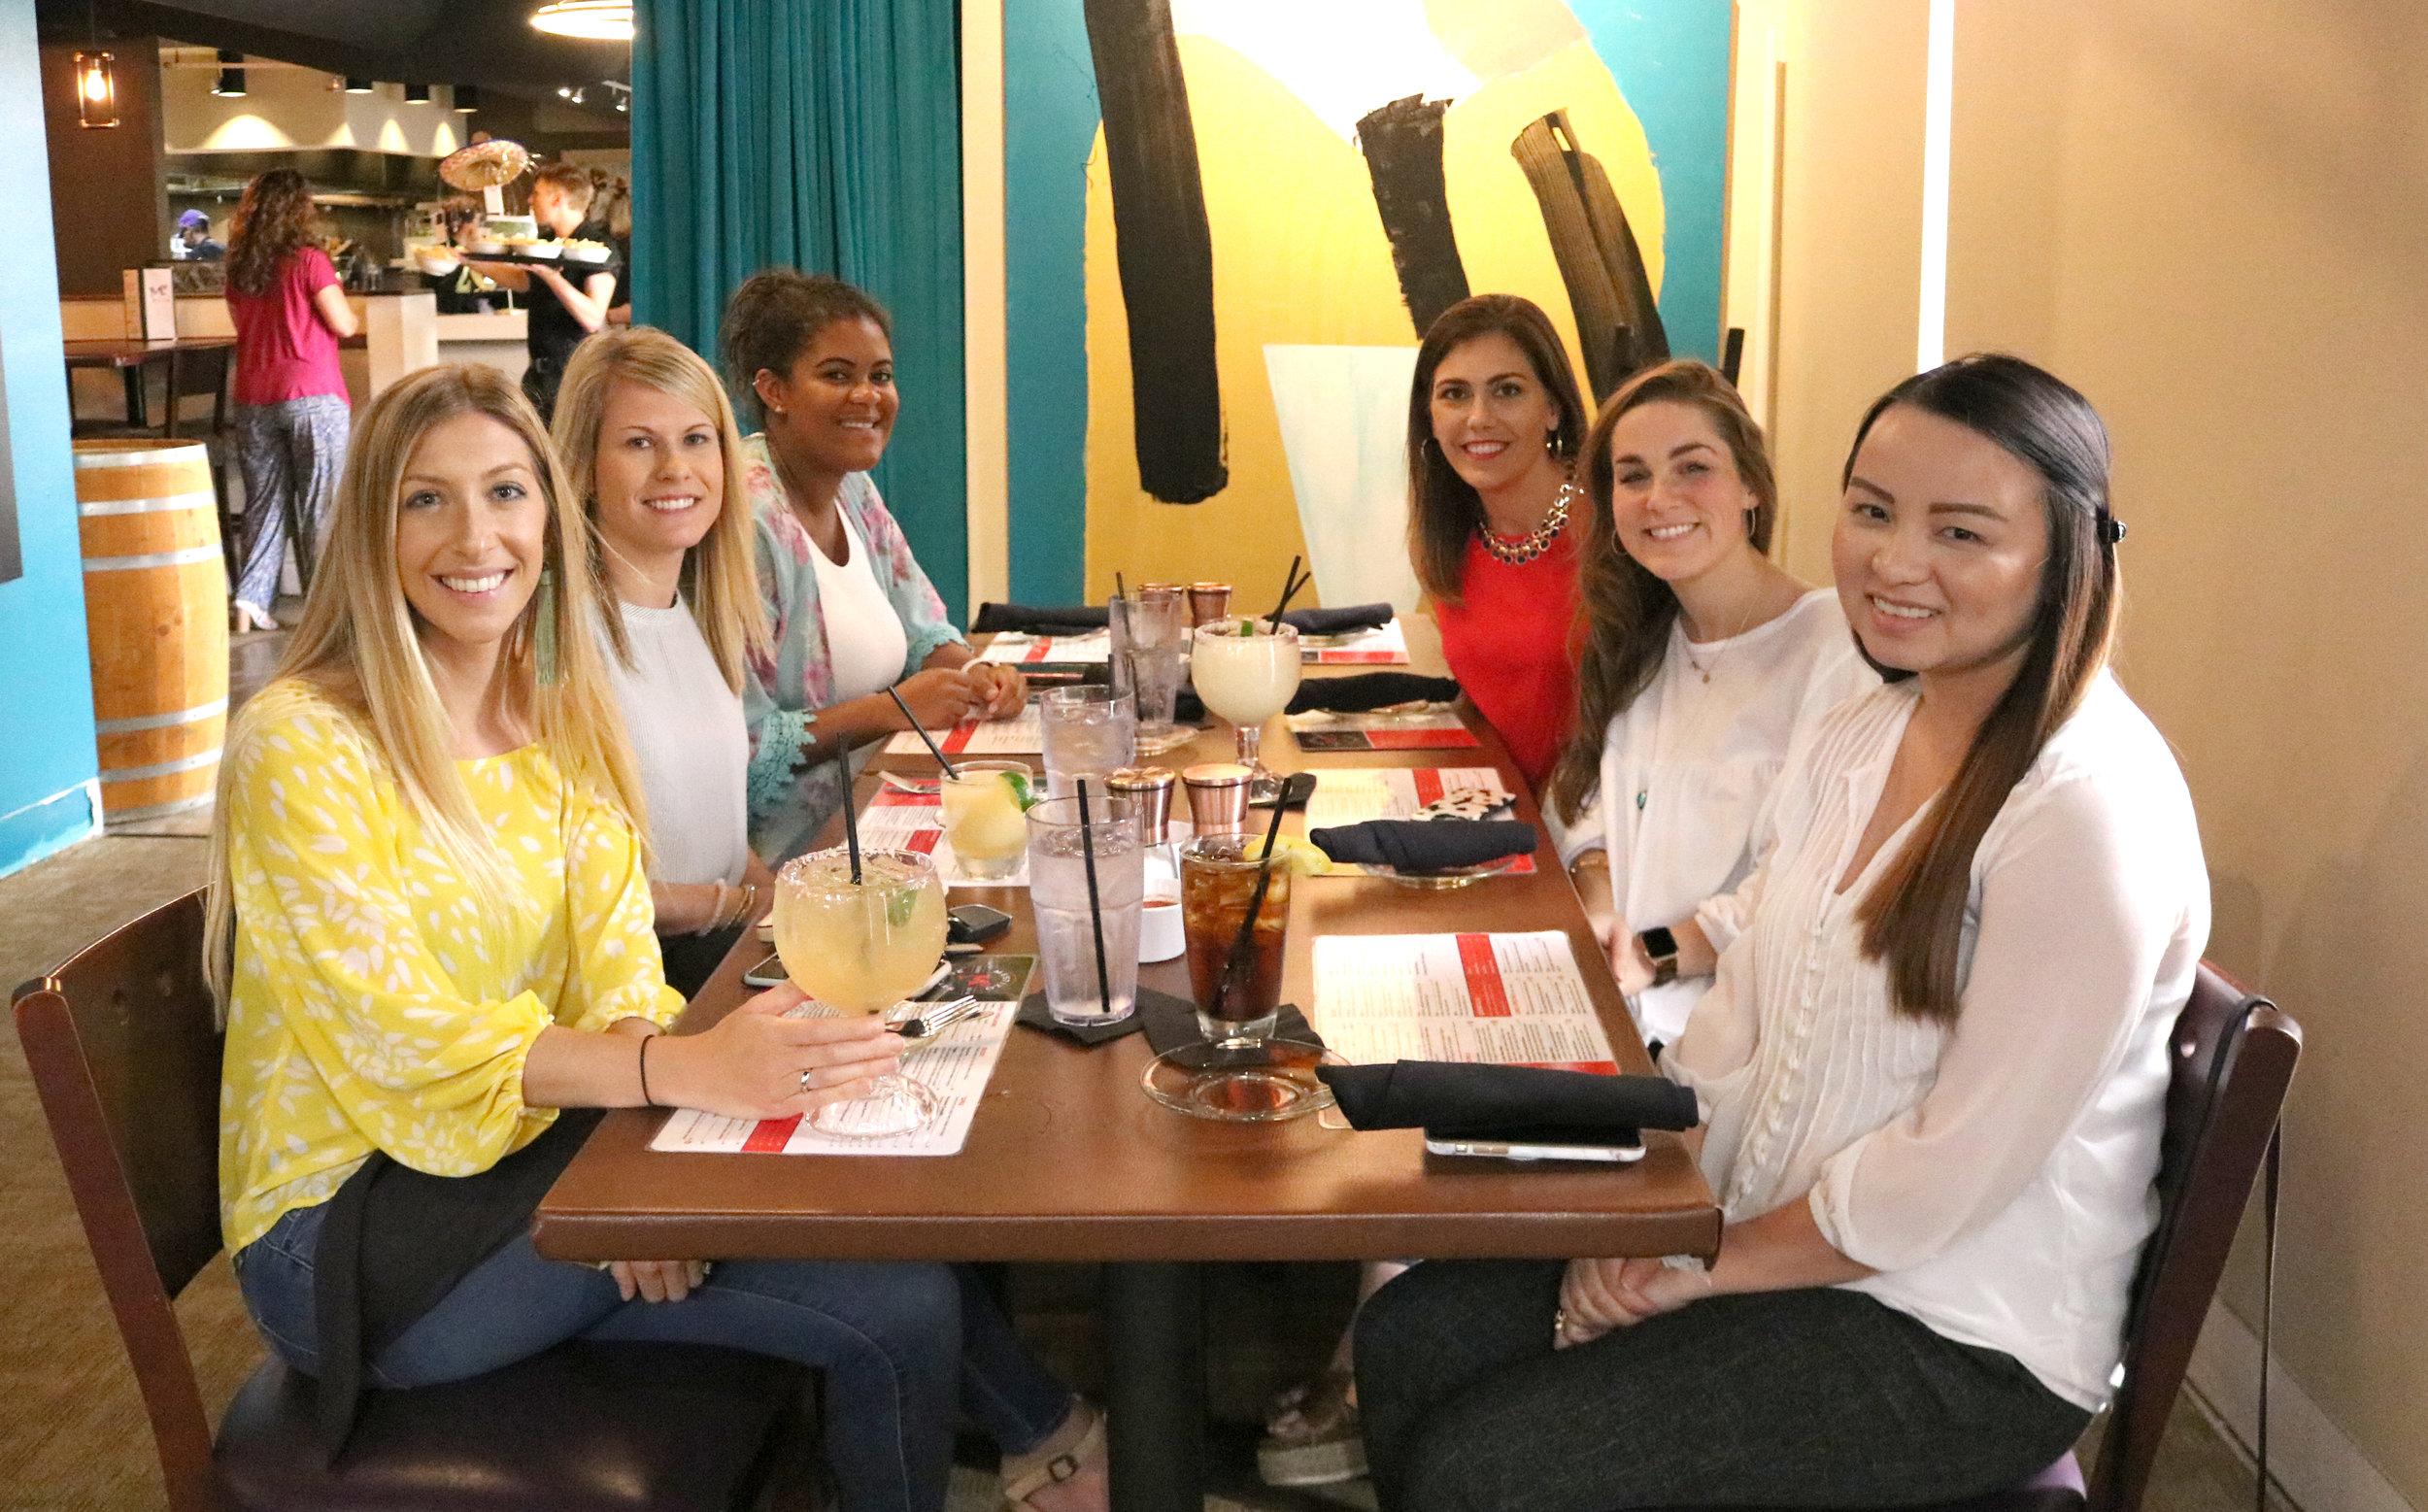 Cameron, Megan, Maia, Lauren S, Taylor P, & Kathy